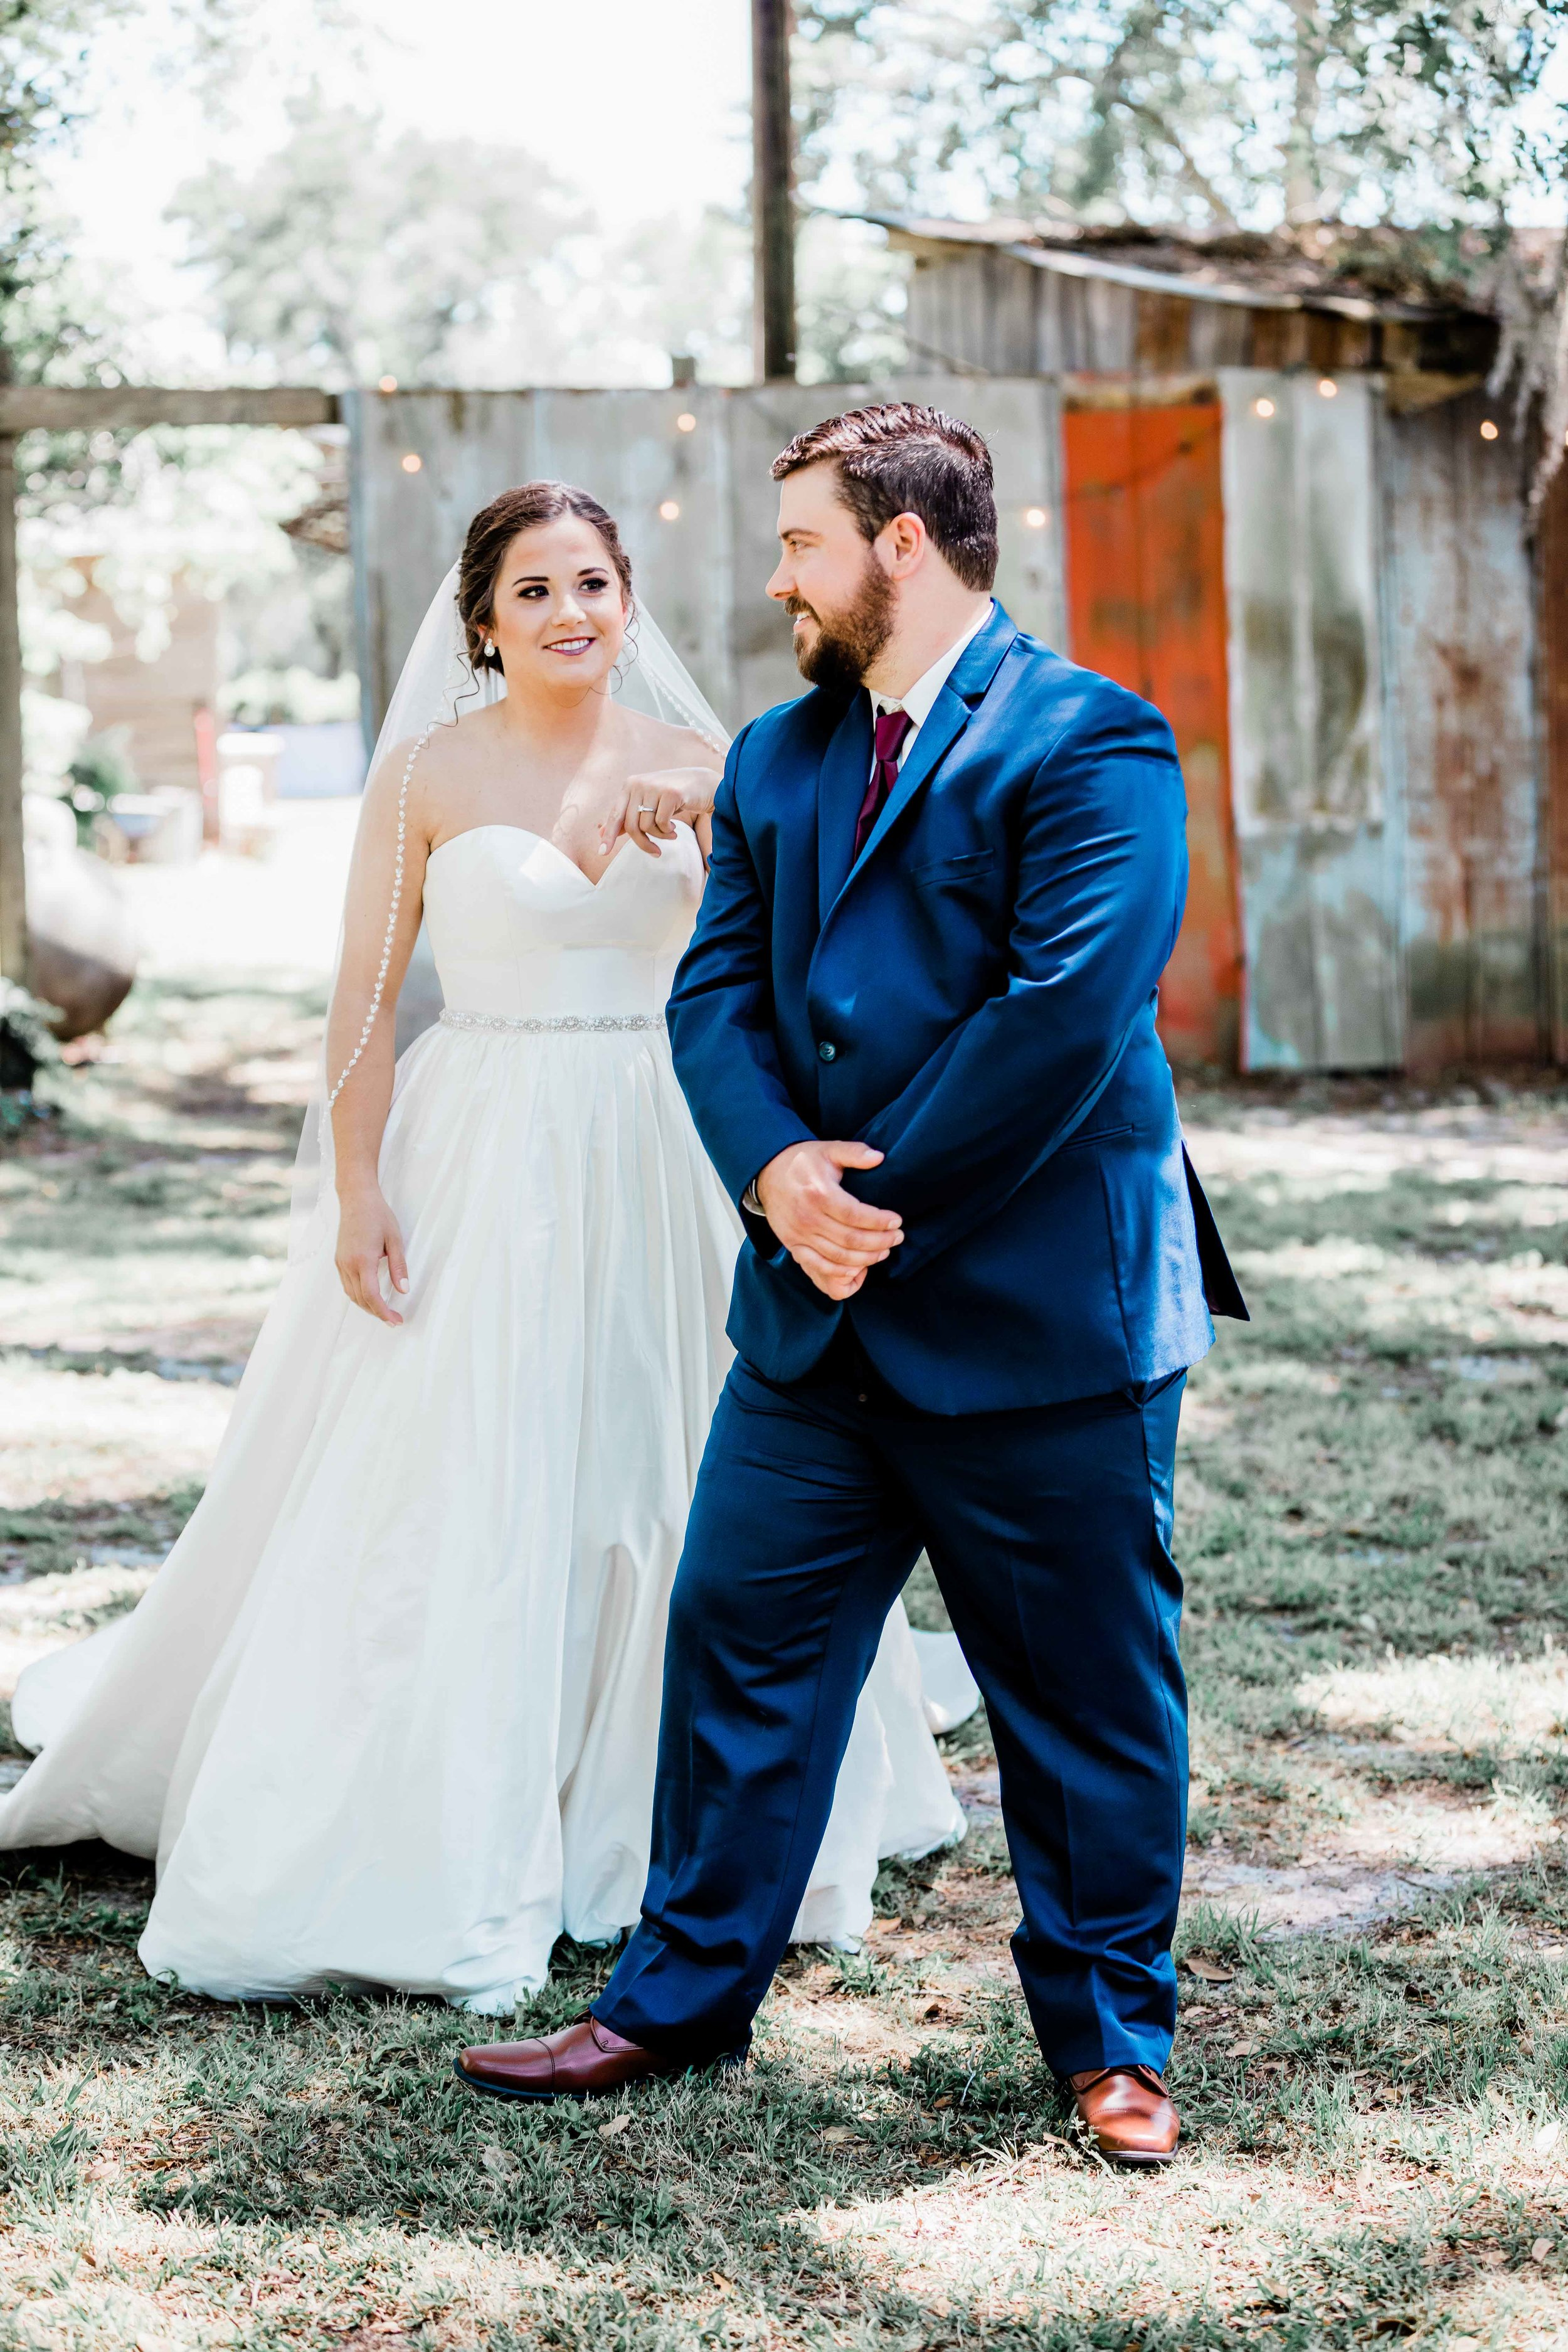 20190427-Southern Lens Photography- Savannah Wedding Photographer-Screven and Caroline-201932.jpg